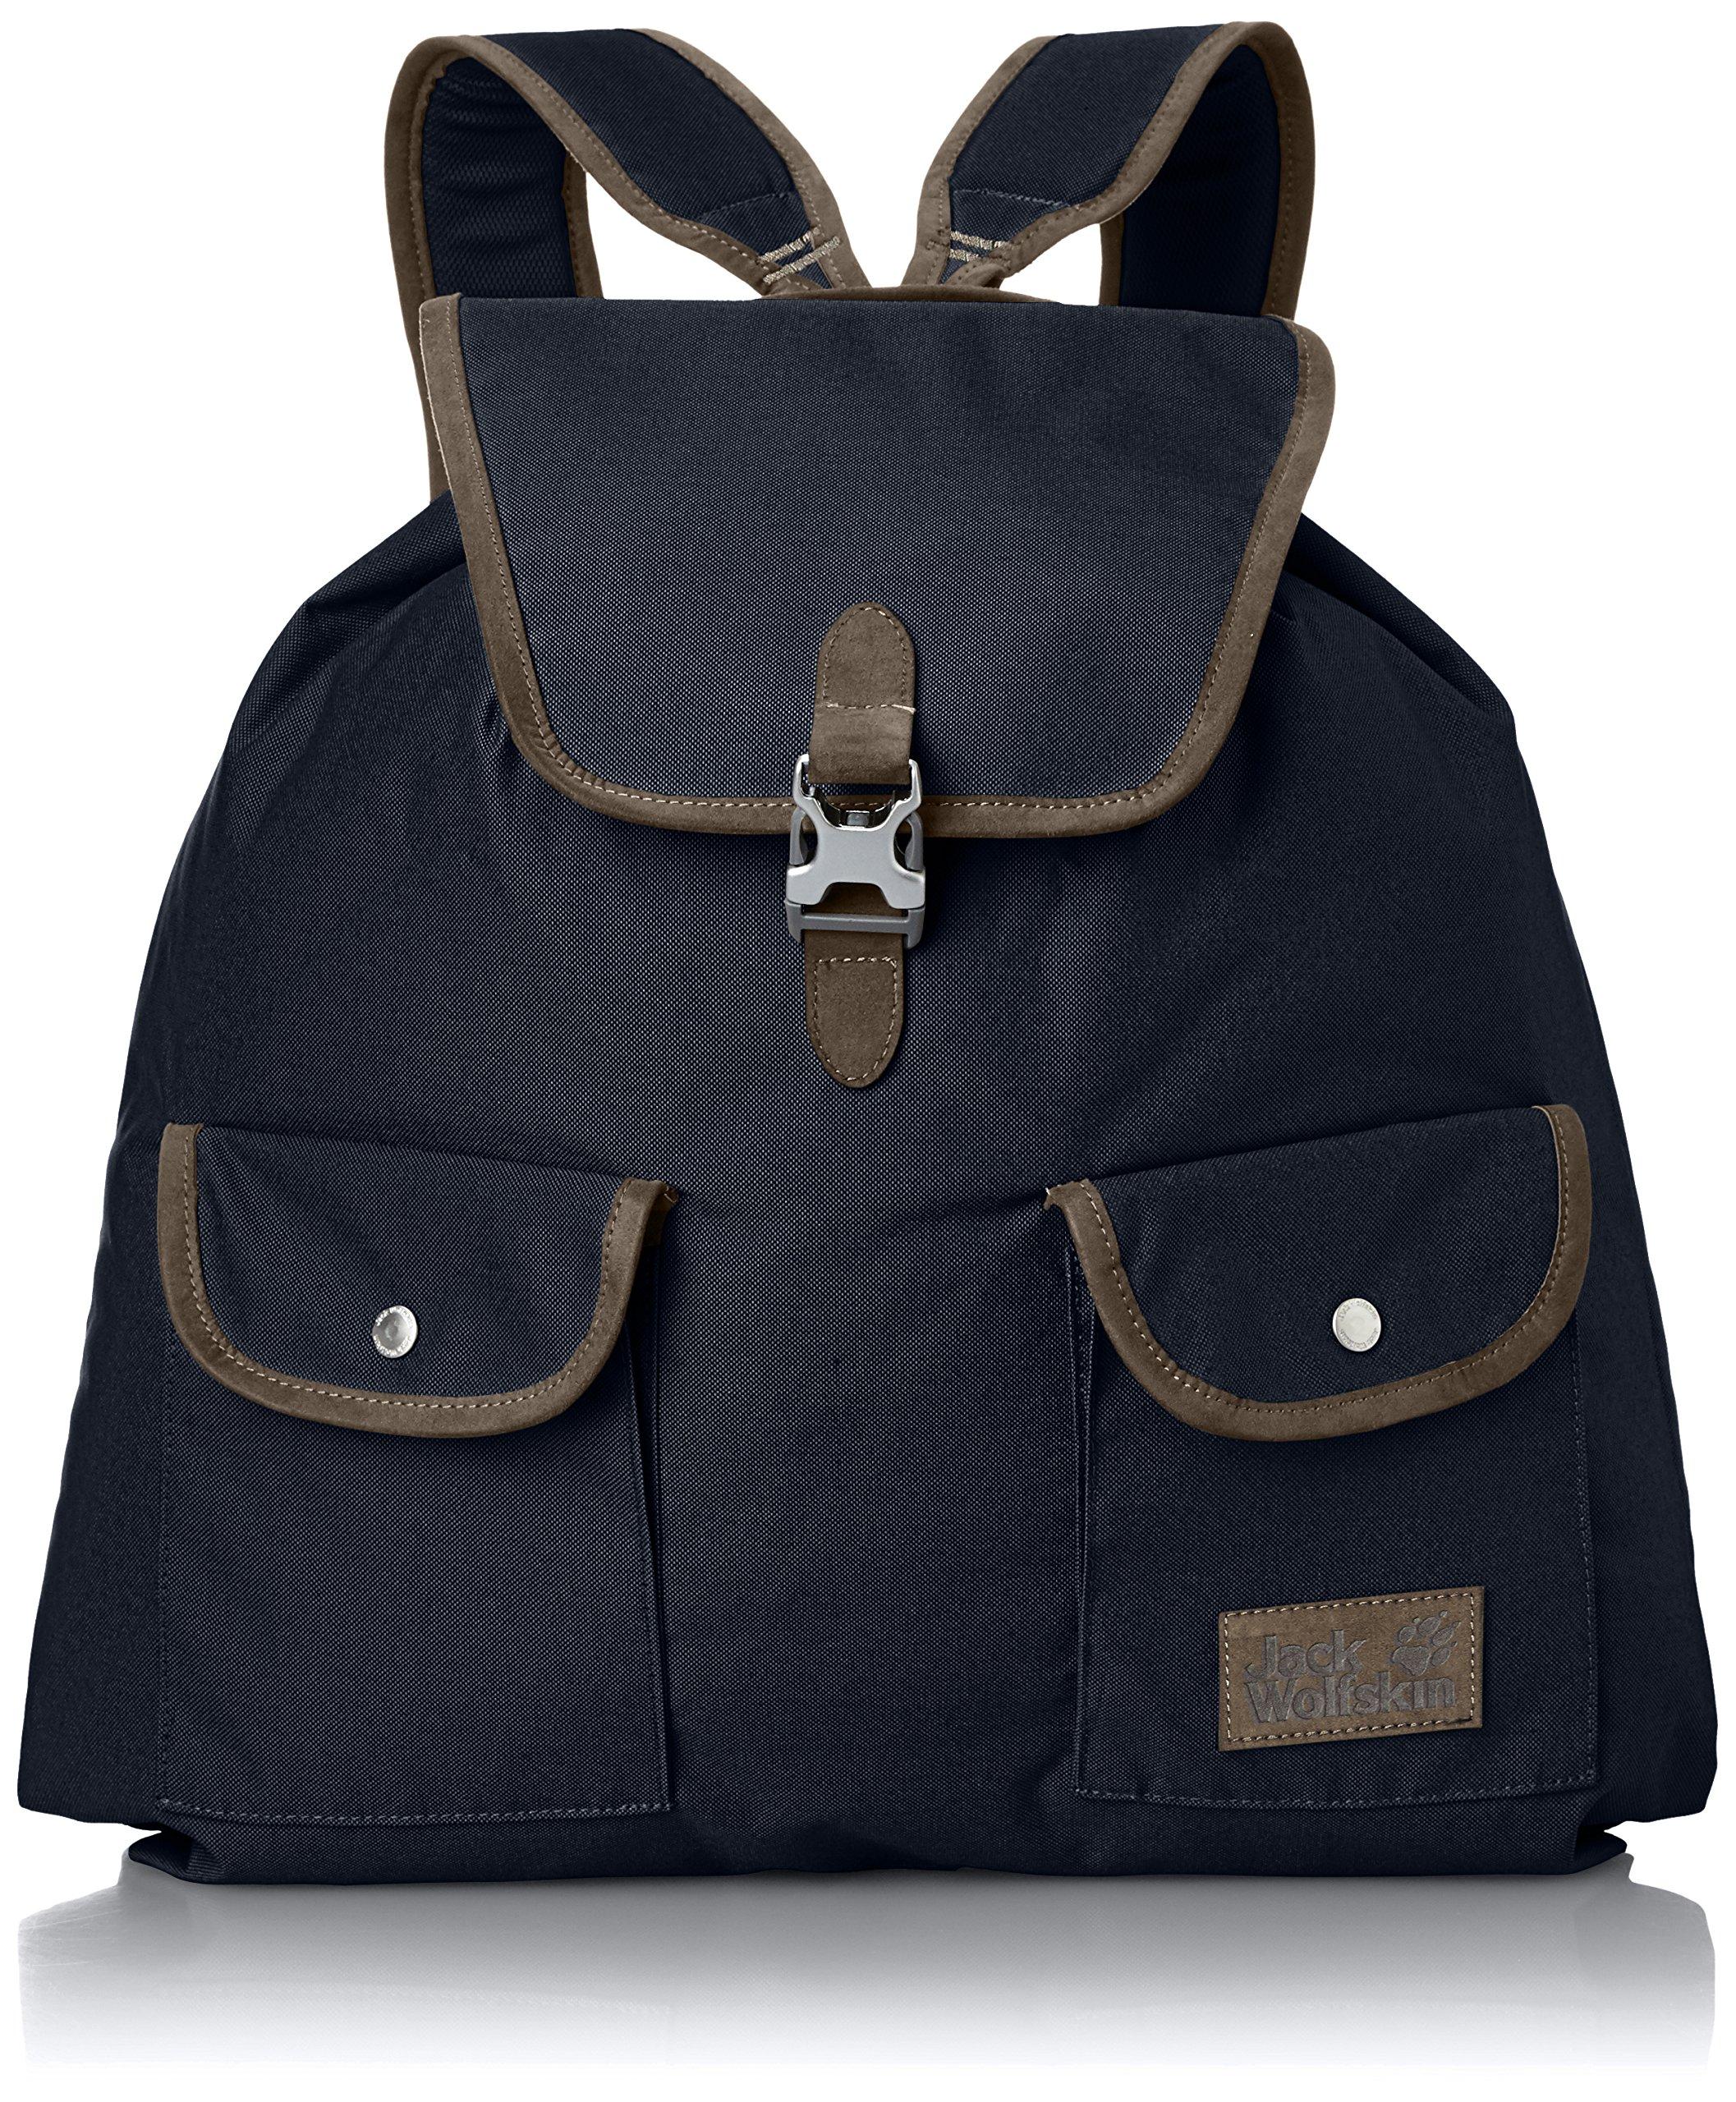 Jack Wolfskin Woodford Daypacks, Night Blue, One Size